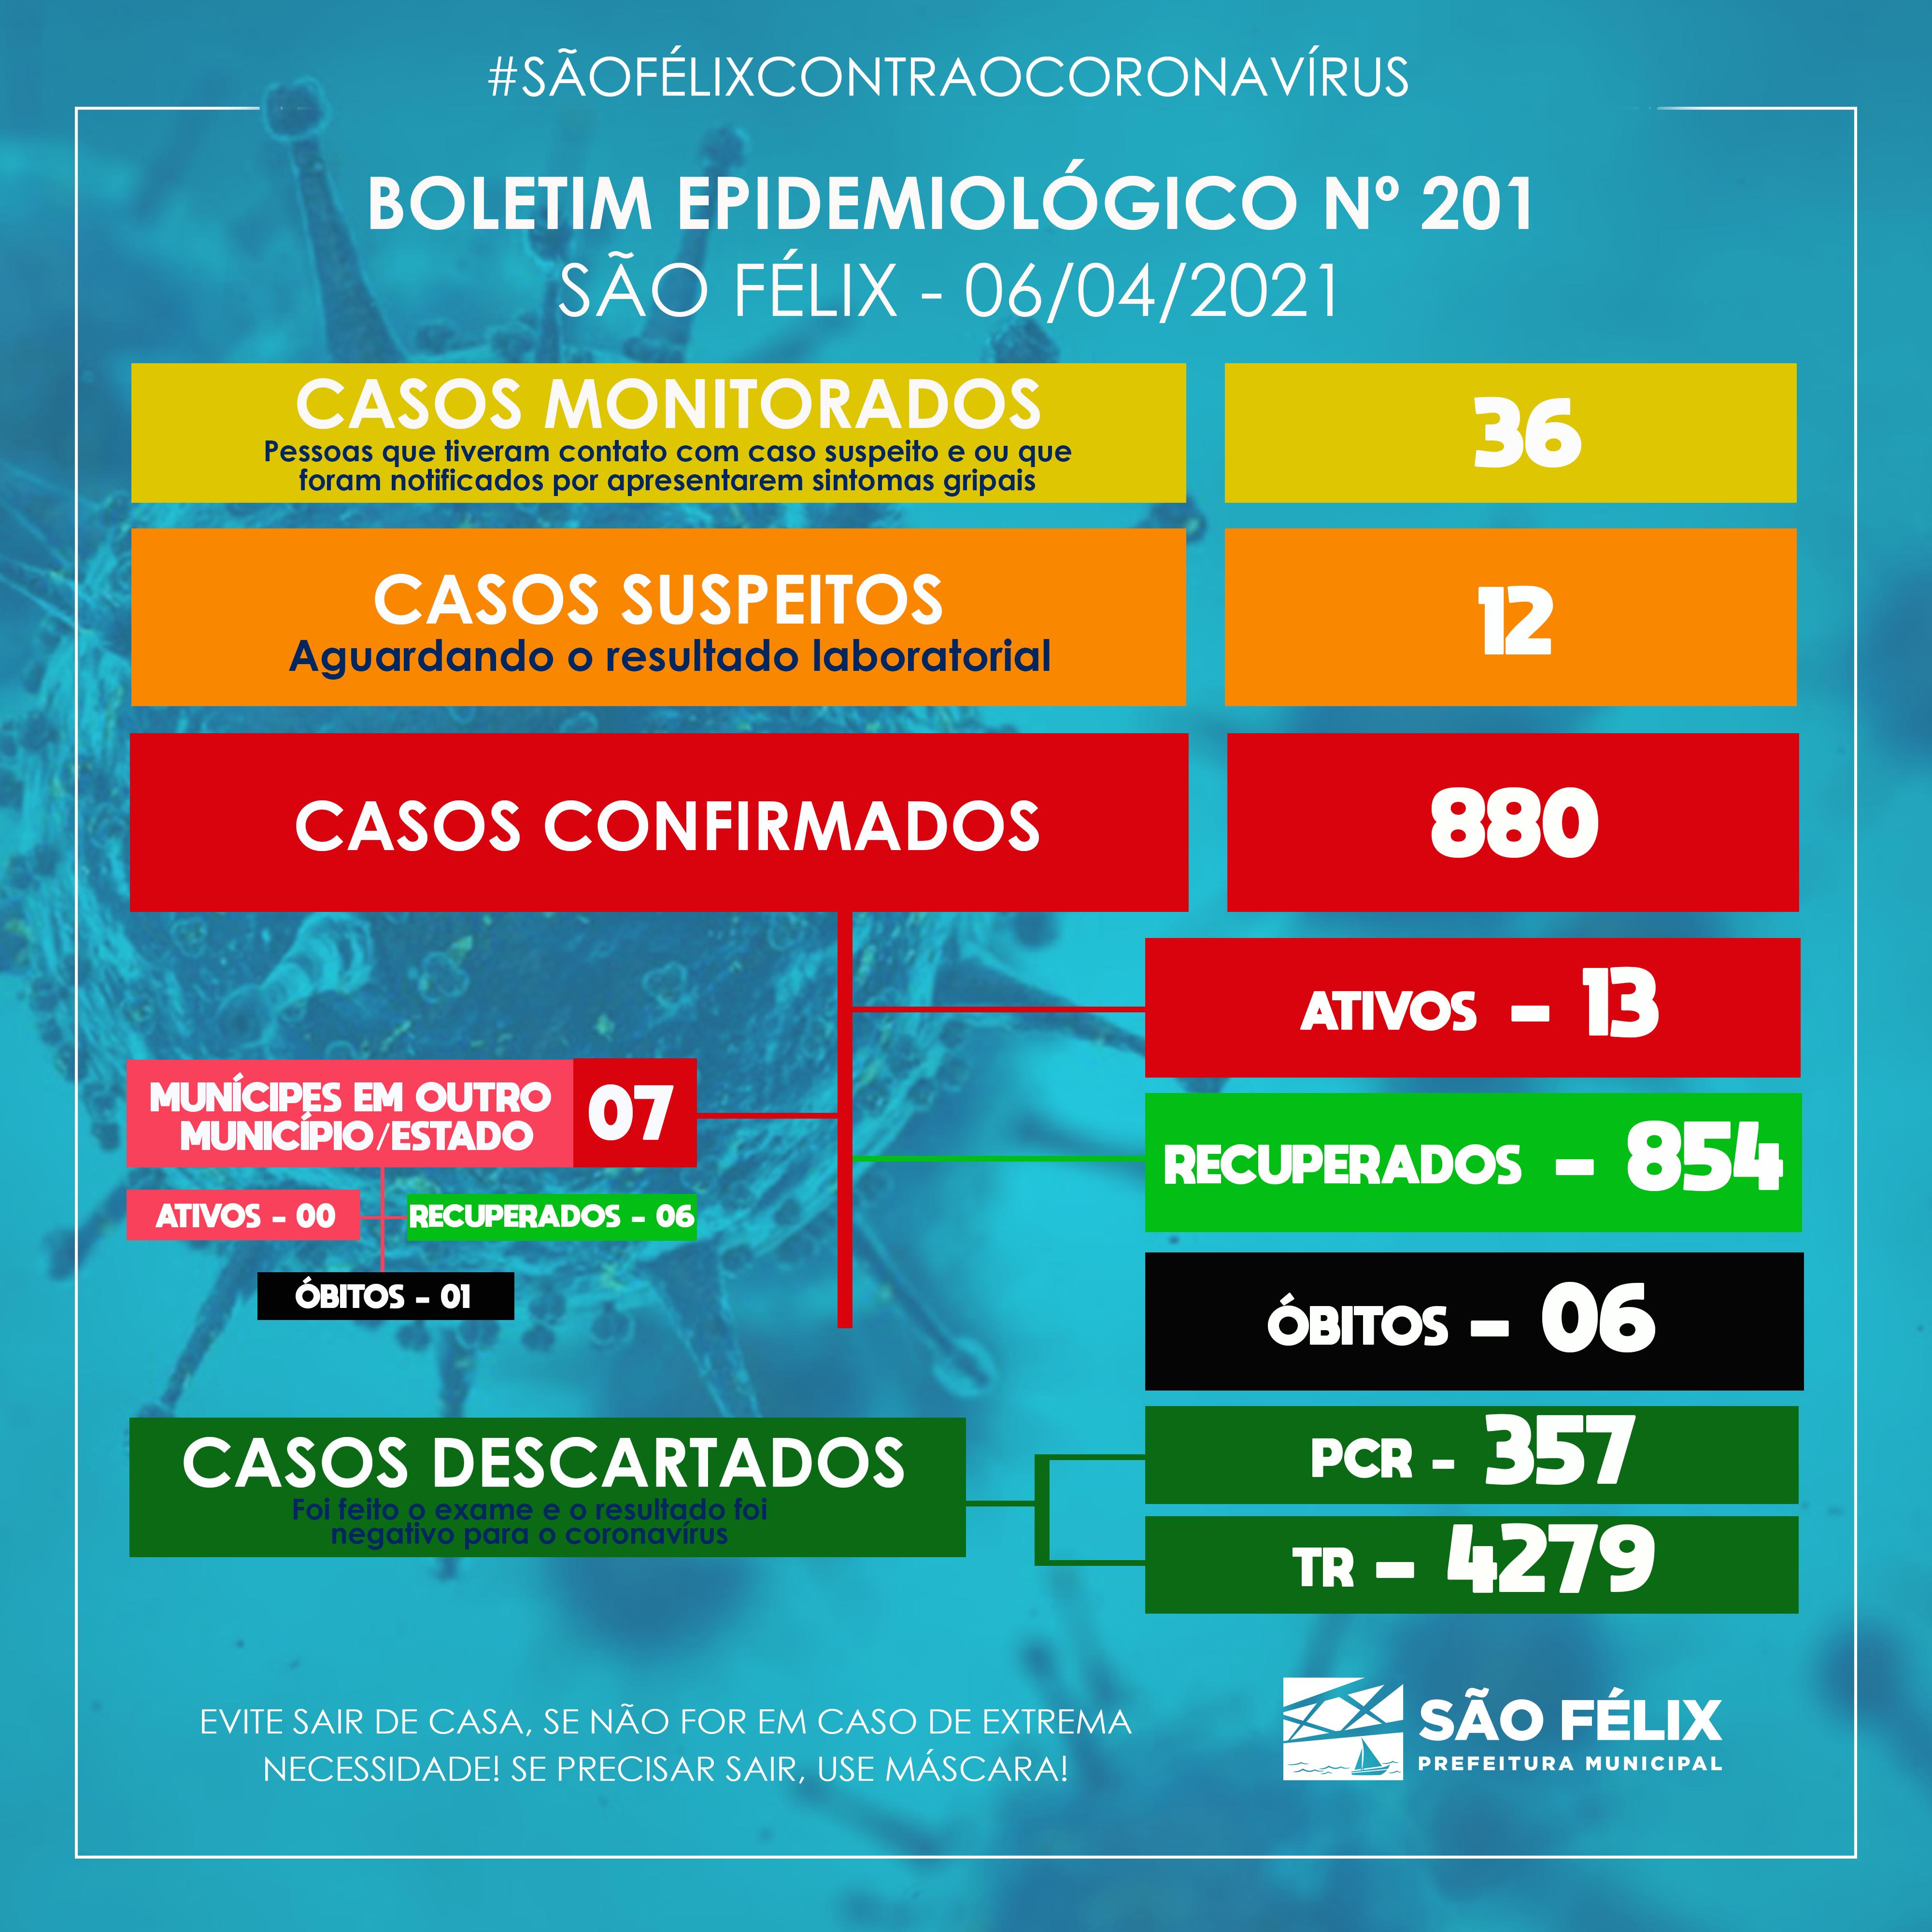 BOLETIM EPIDEMIOLÓGICO Nº 201